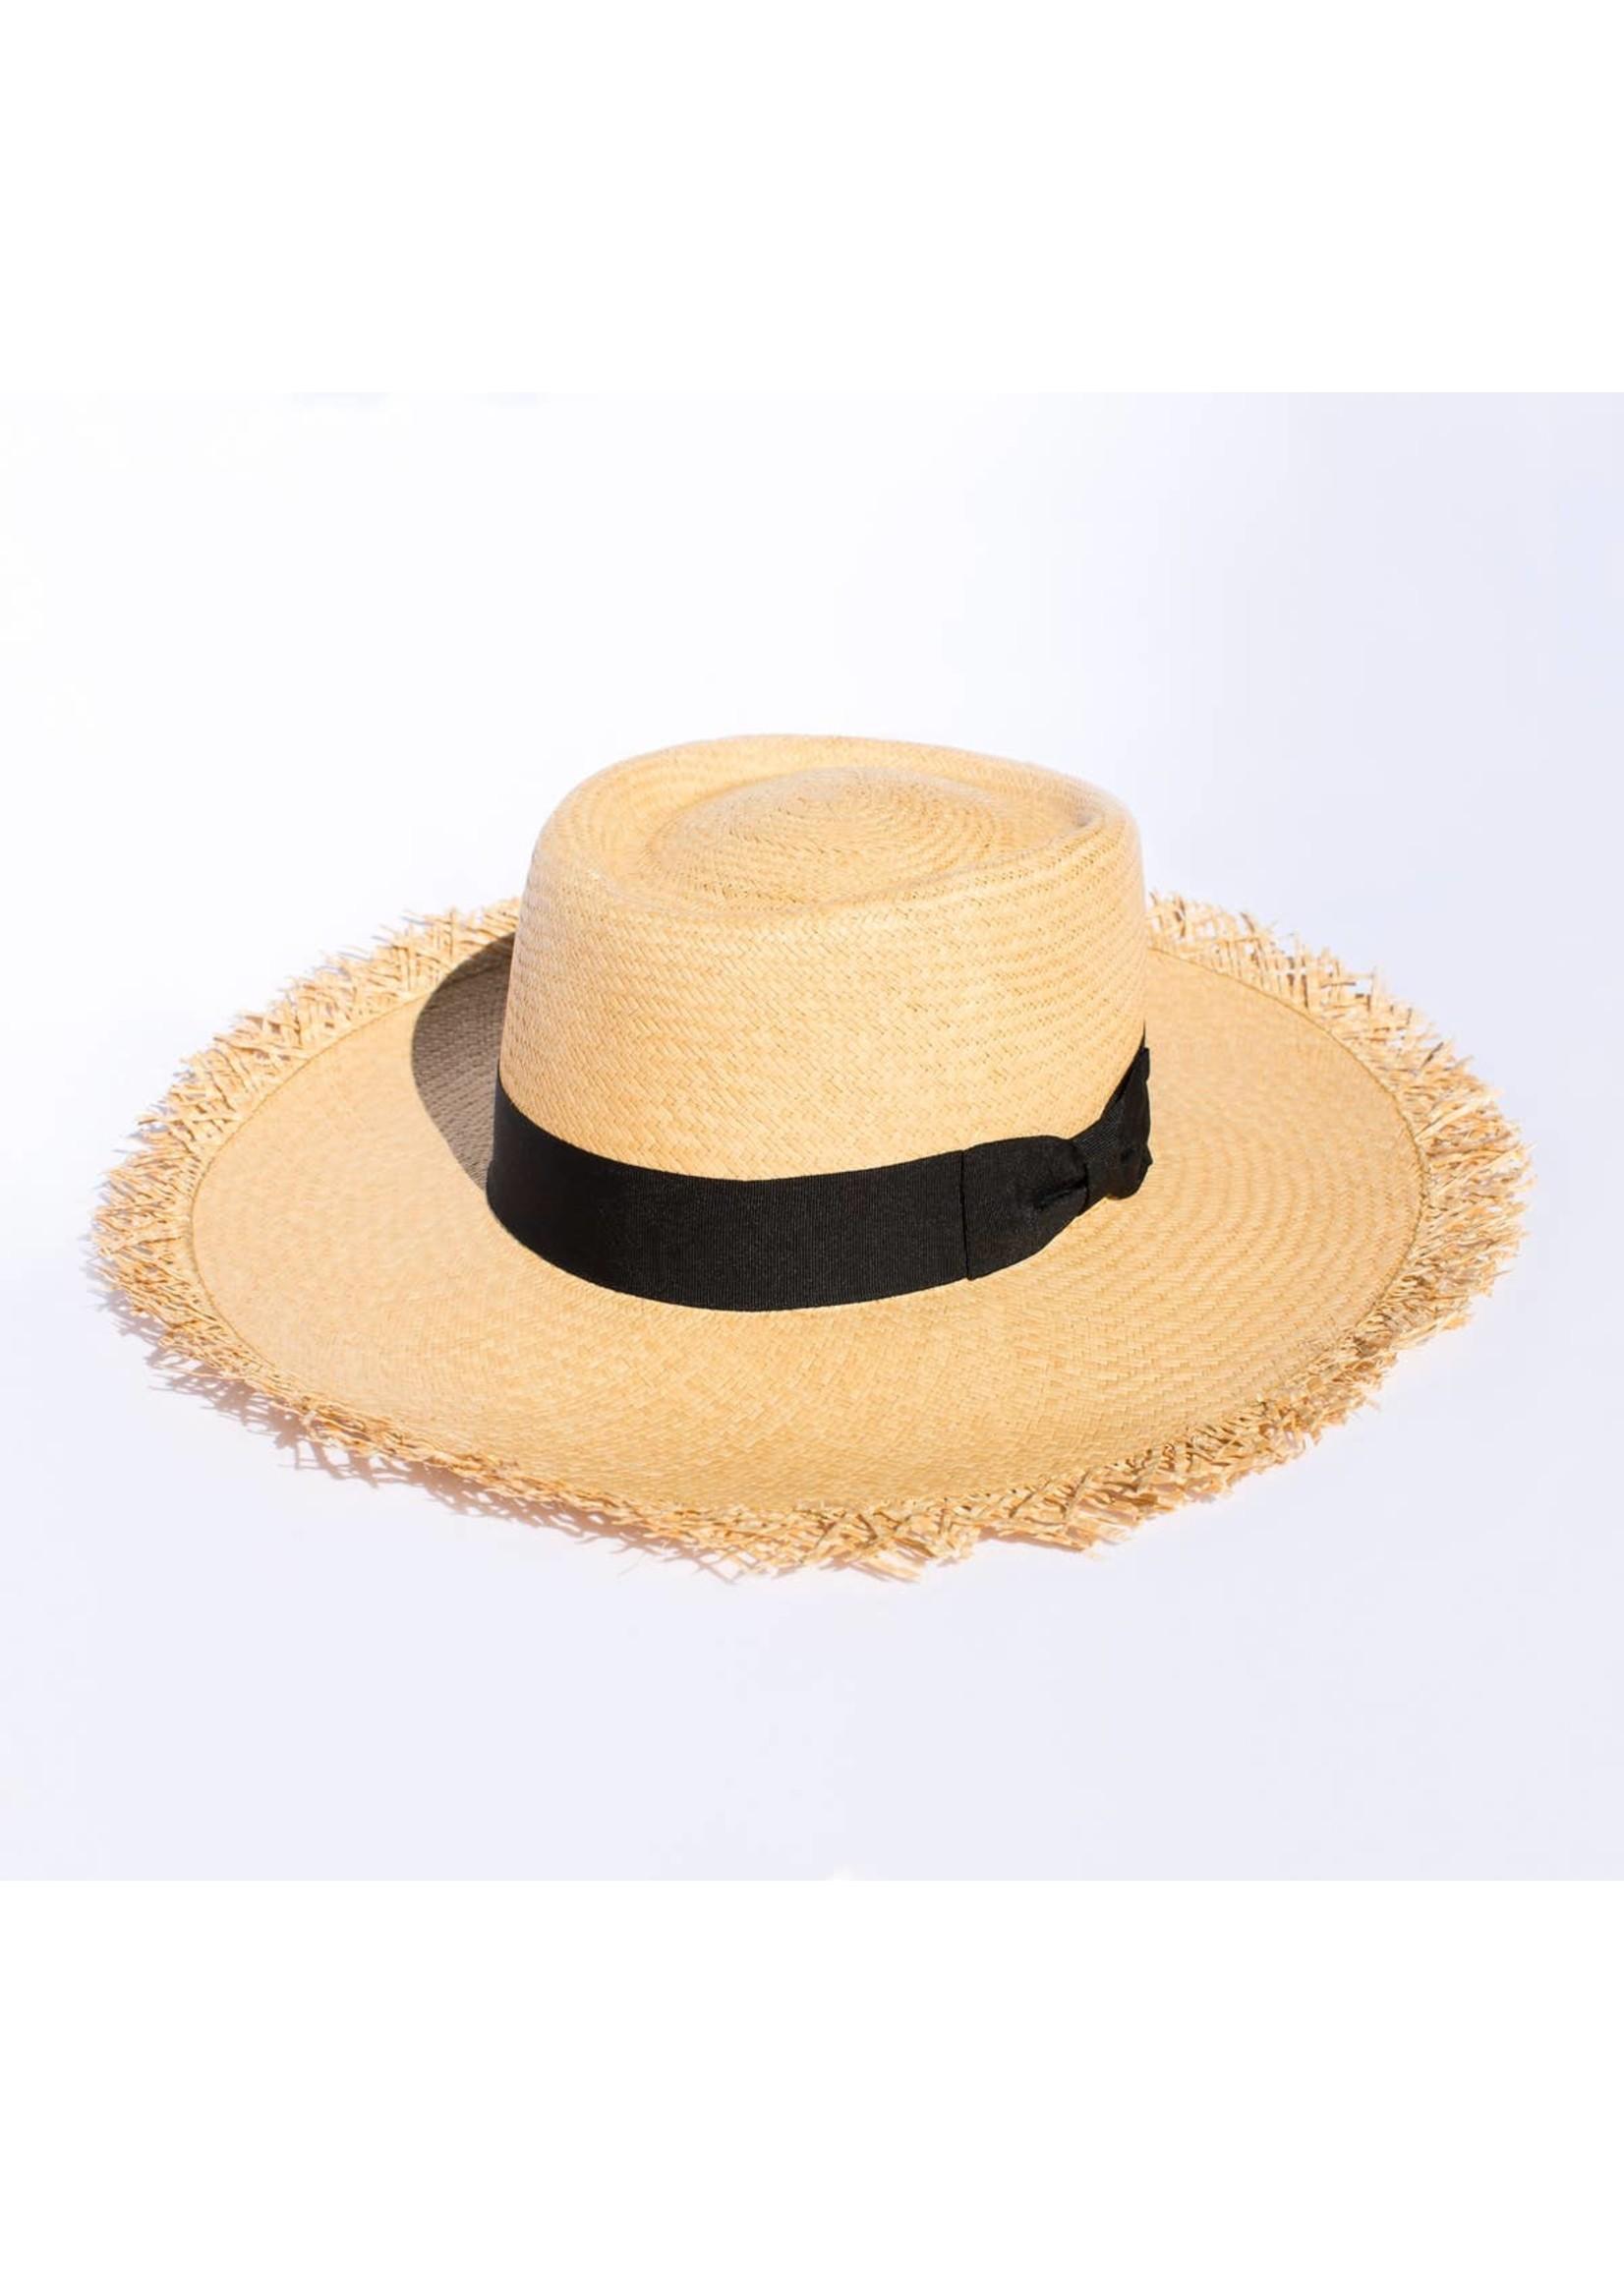 Elegancia Tropical Hats Loose Straw Panama Hat